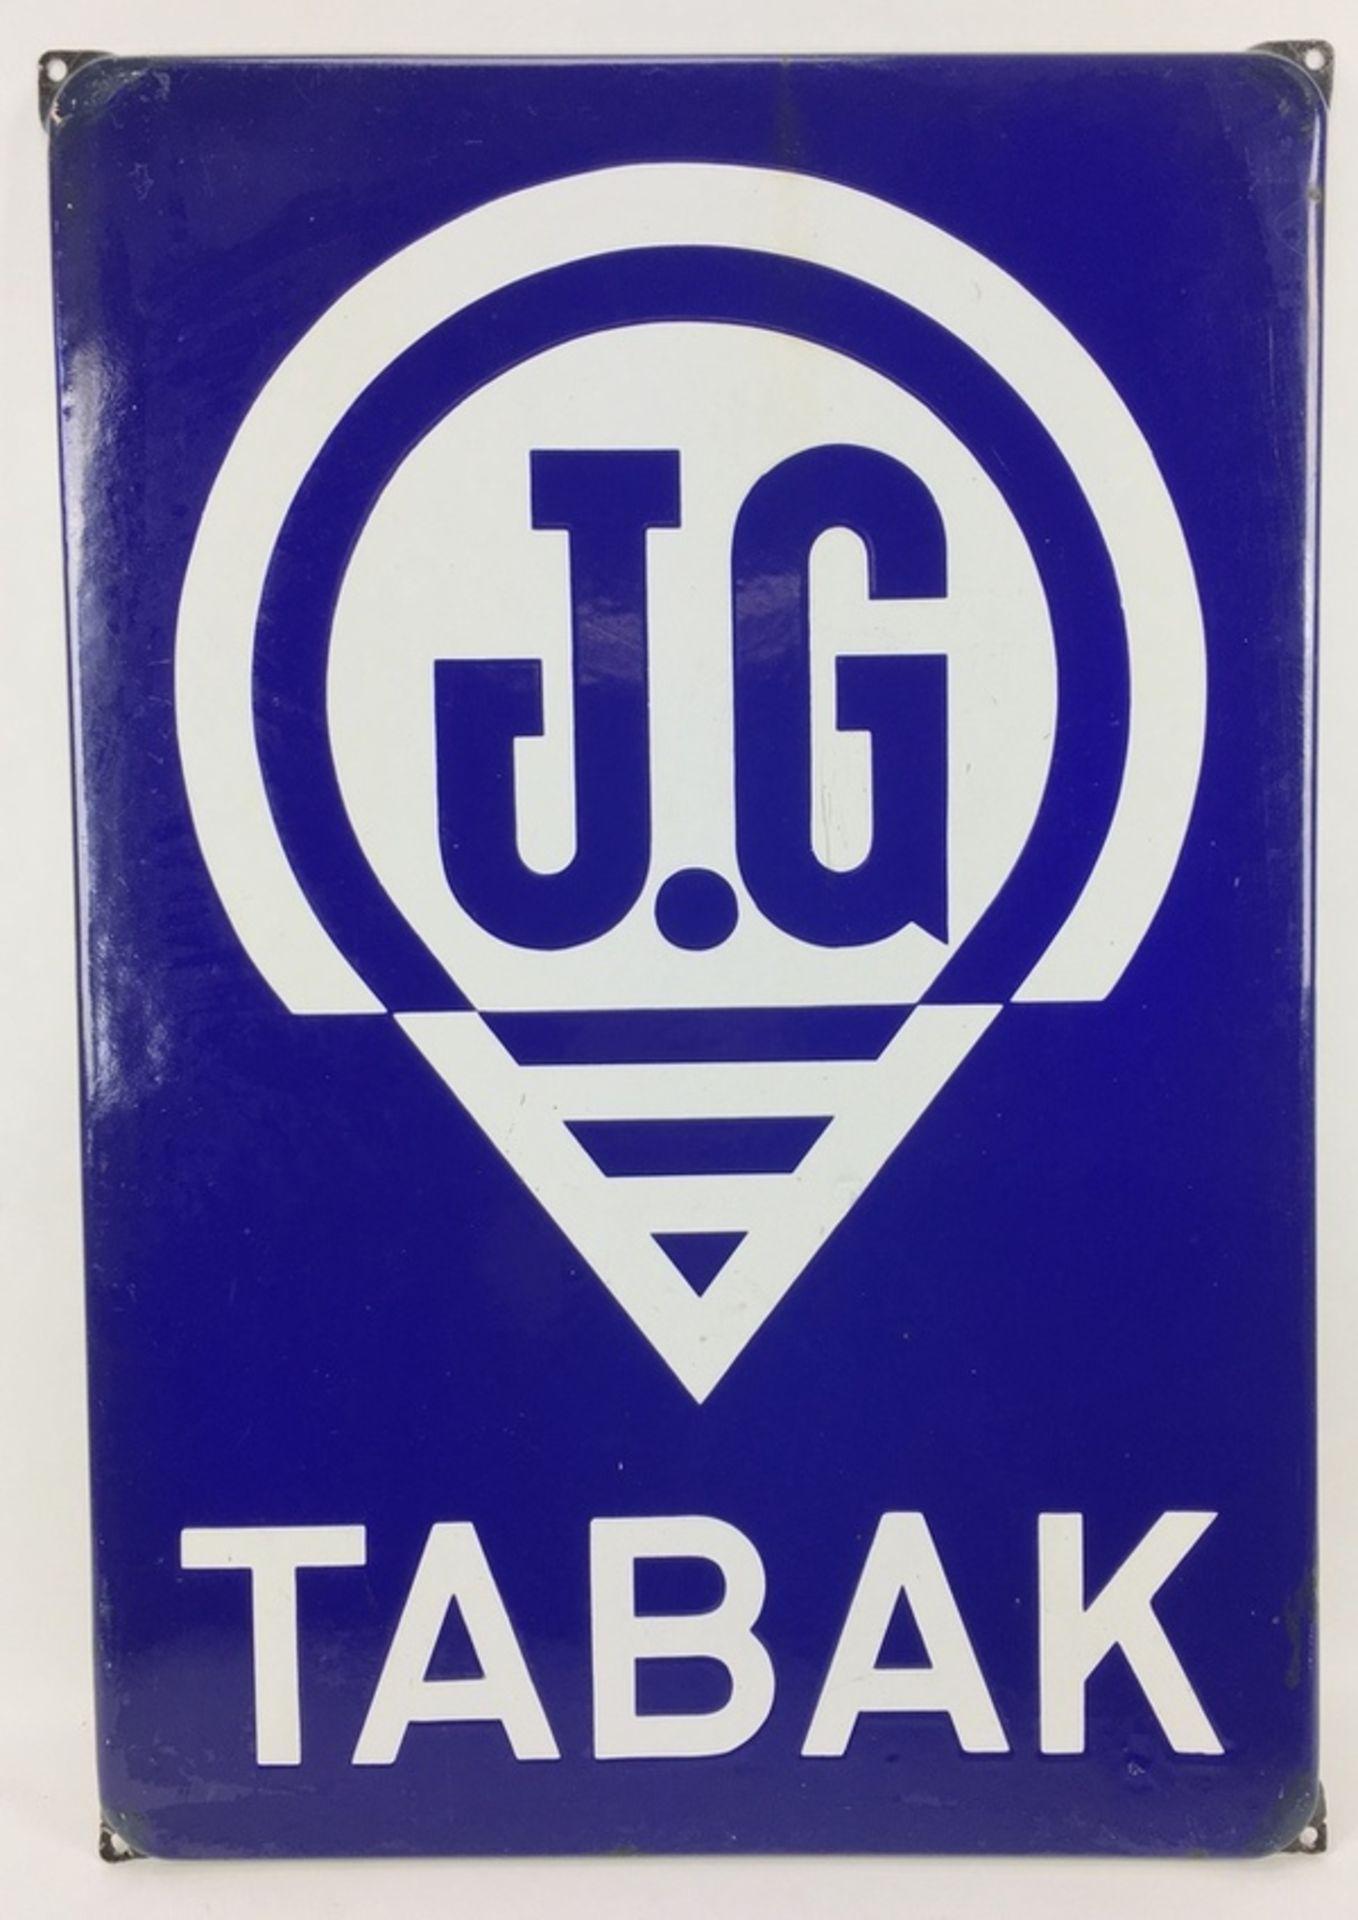 (Curiosa) Emaillebord JG TabakEmaille reclamebord J.G. Tabak. Jan Gruno tabaksfabrikant te Gro